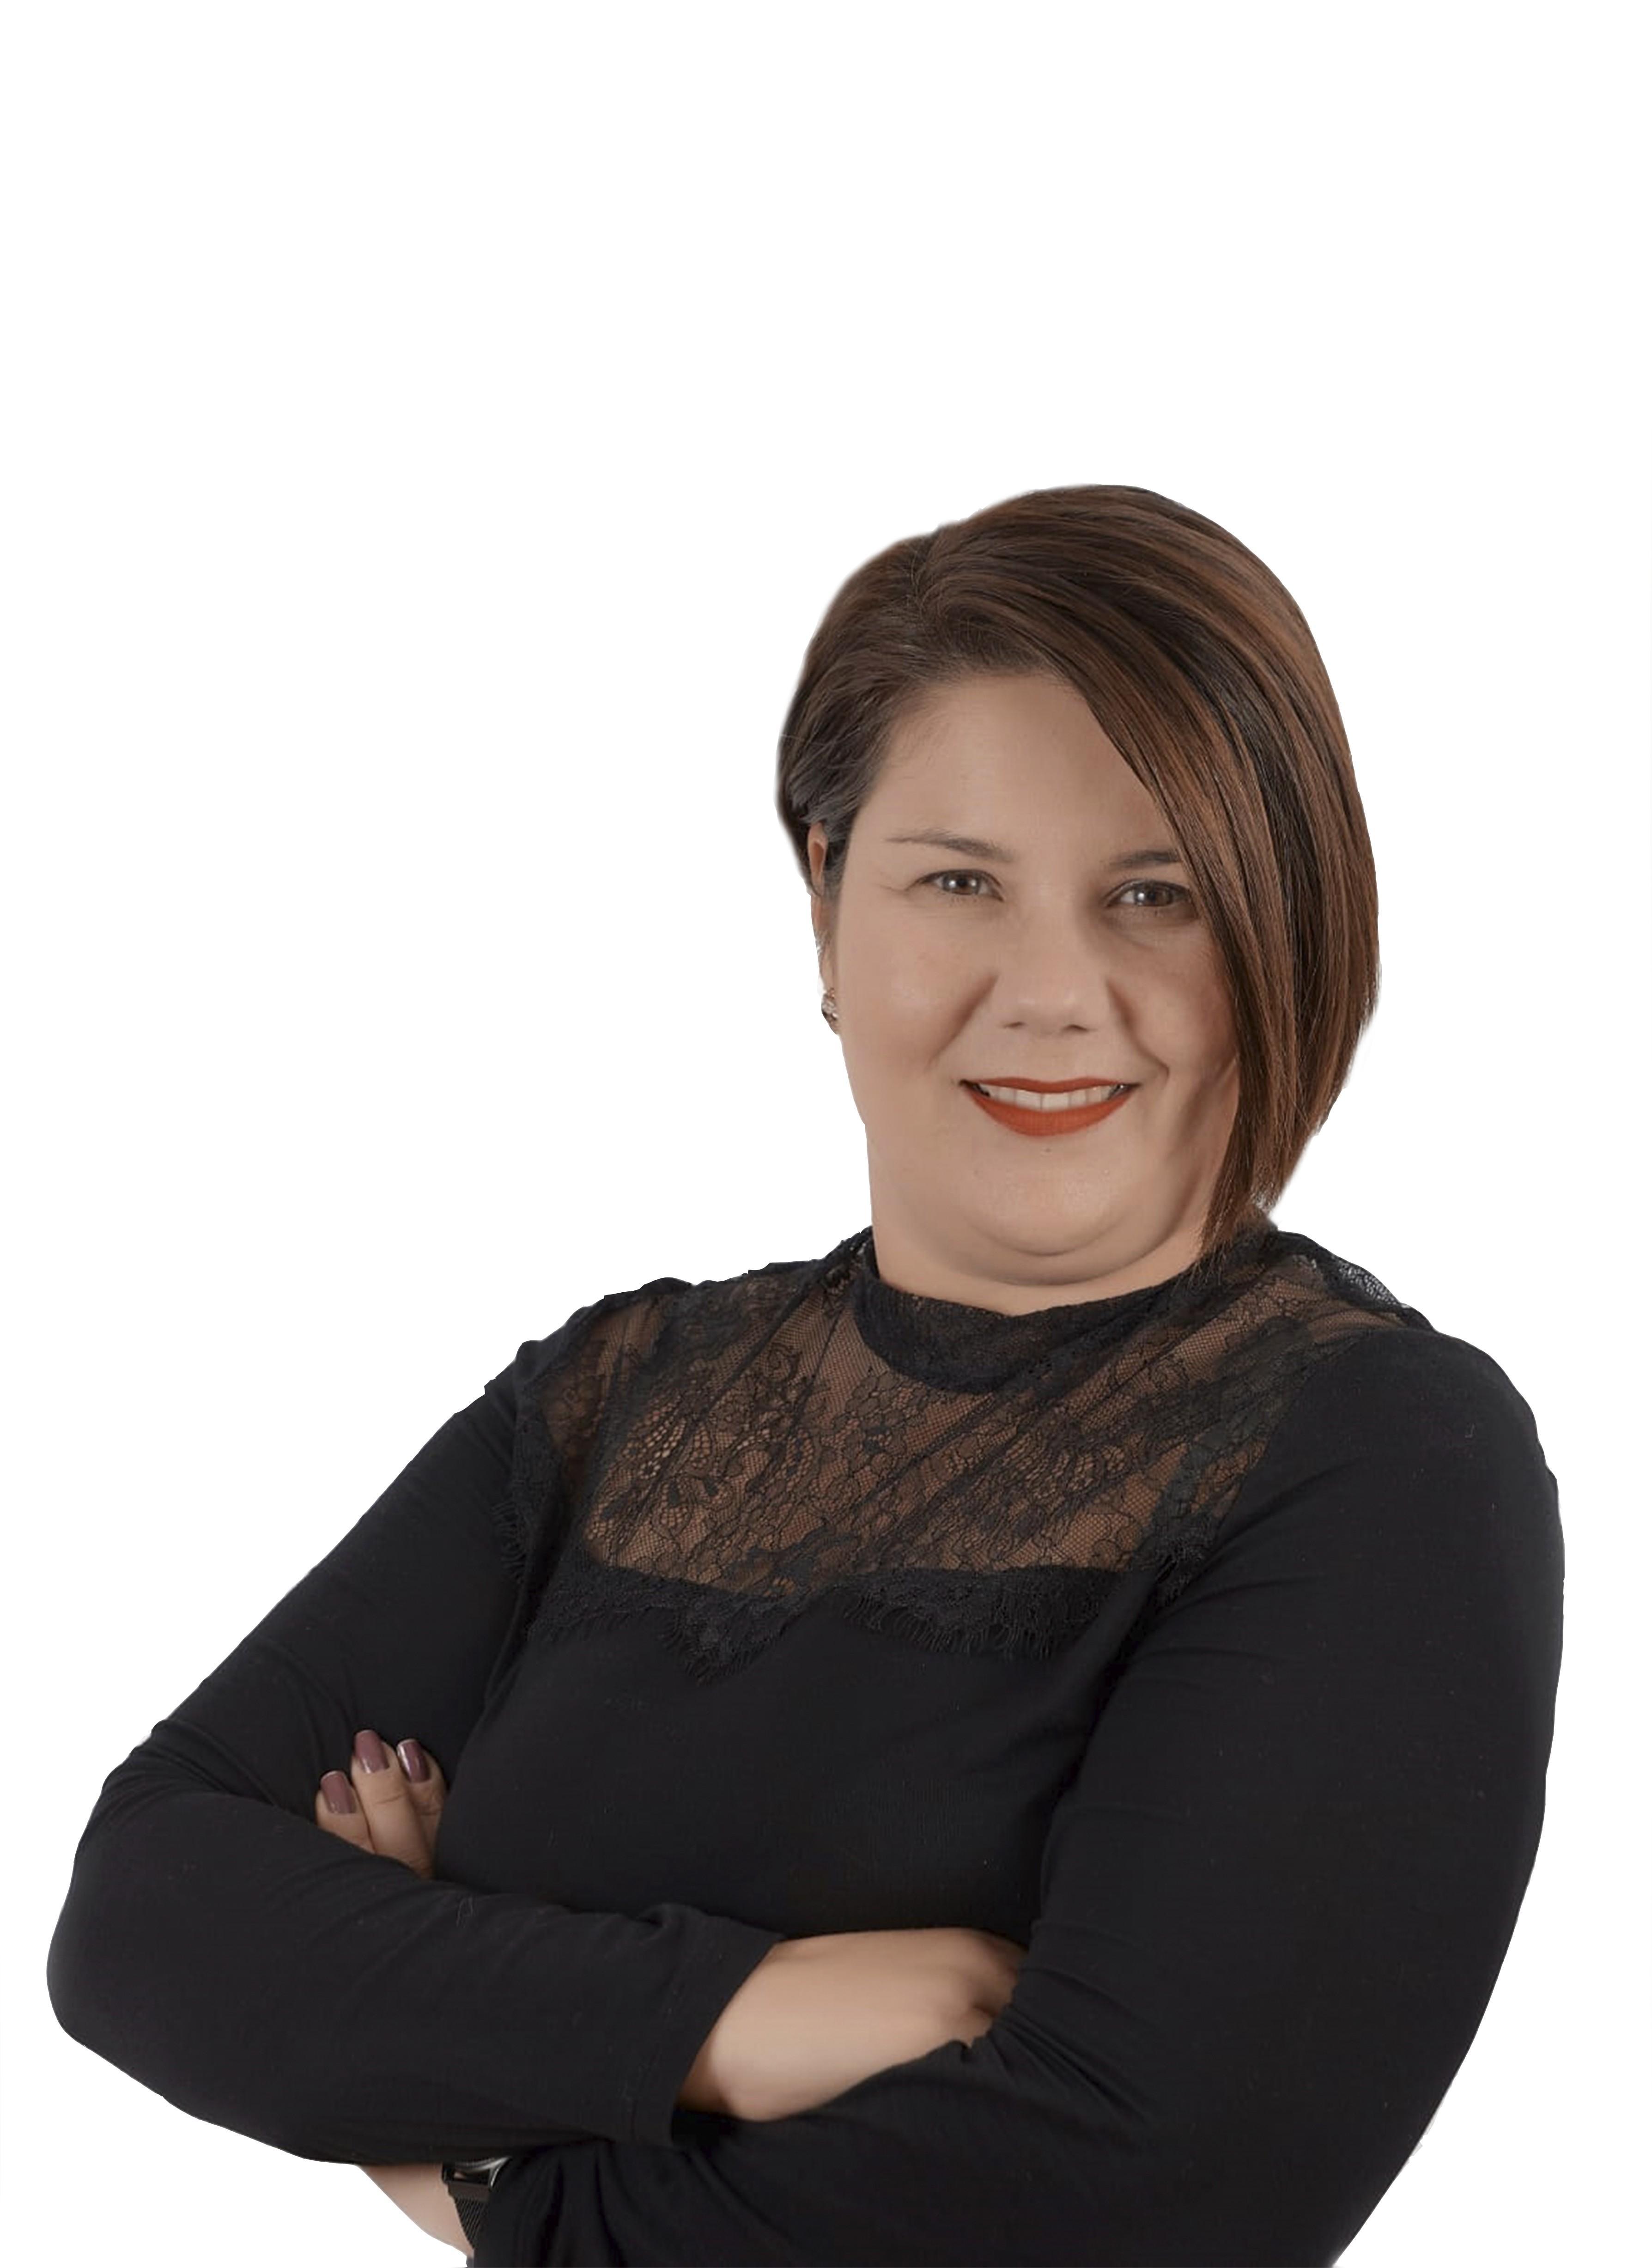 Gemma Garrido Ramos